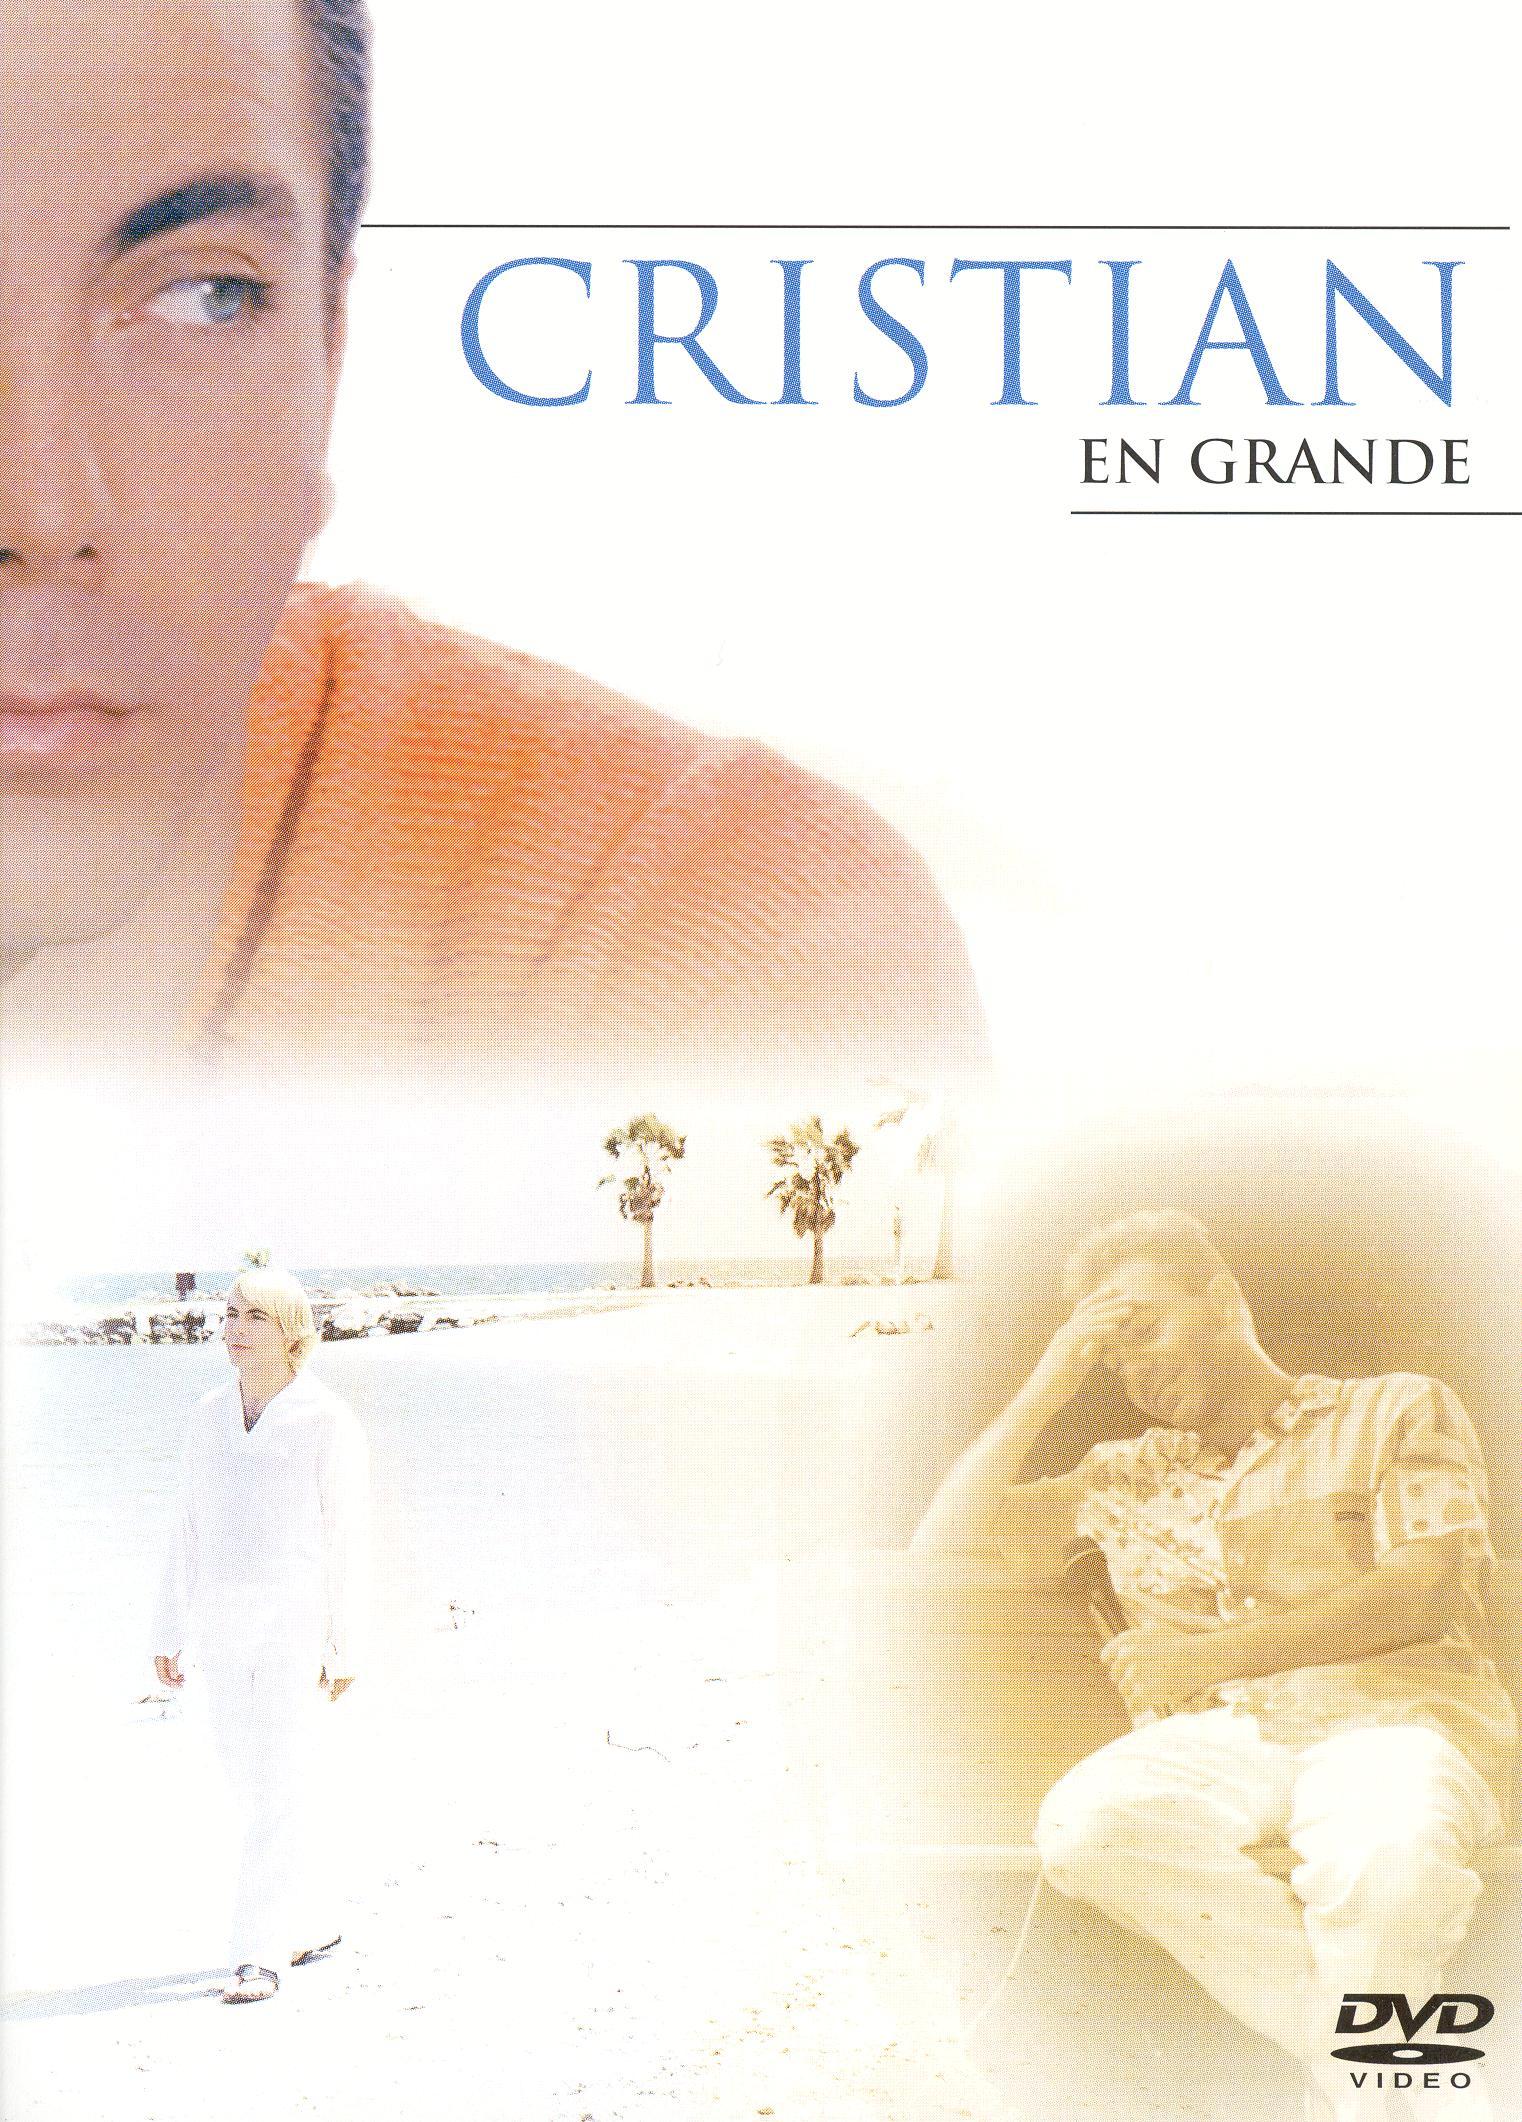 Cristian: En Grande